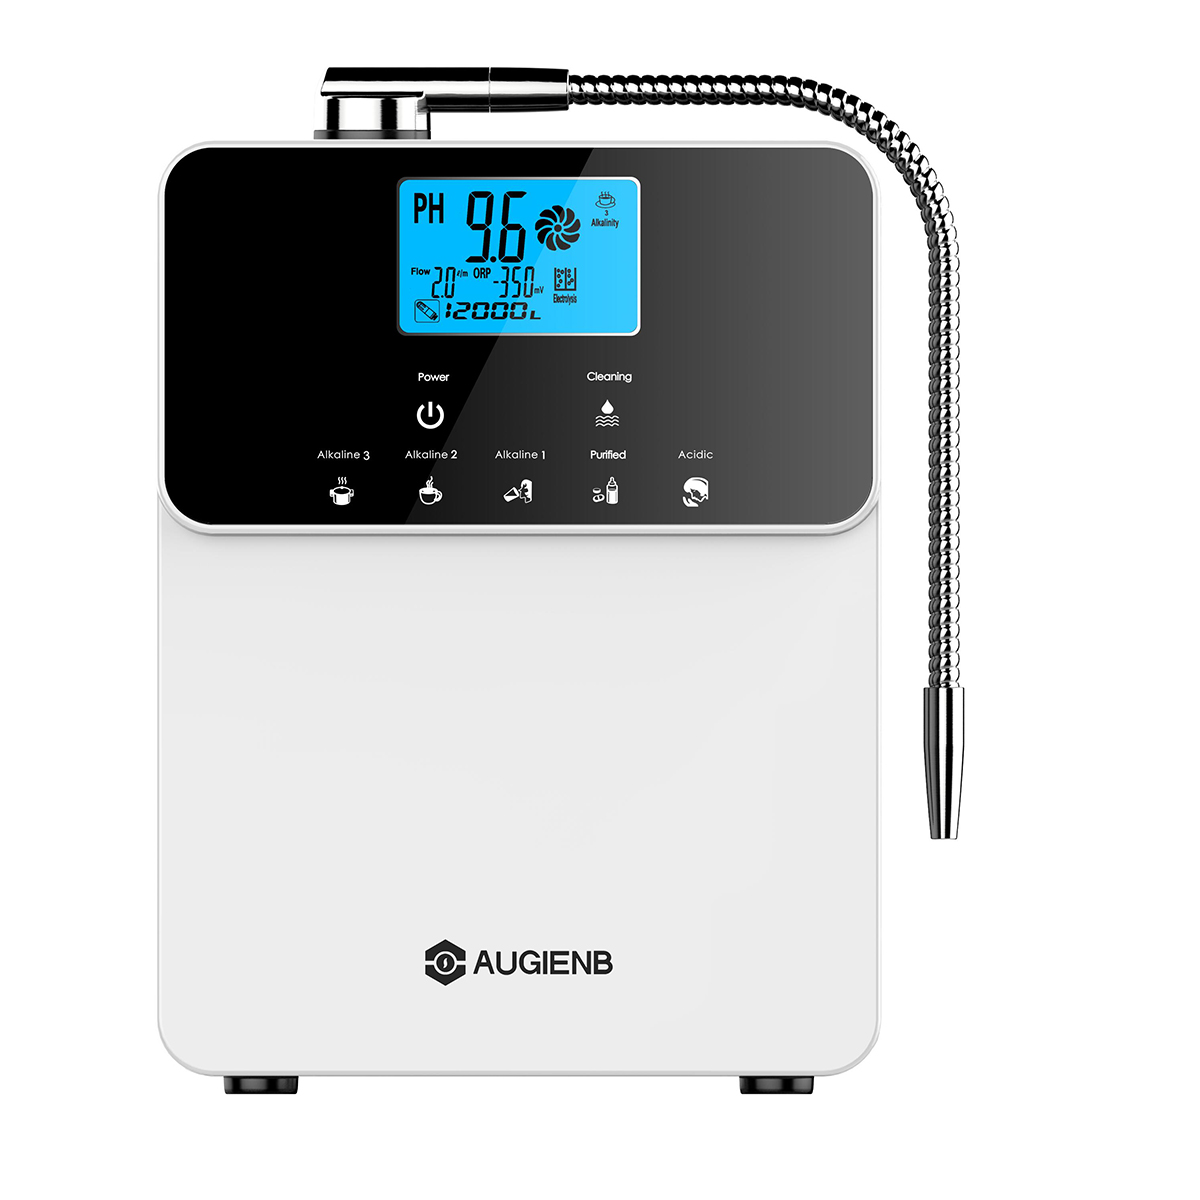 Purificador de agua Augienb PH3.5-11 L purificador de agua Ajuste de ácido alcalino 5 ajustes de modo de limpieza automática LCD filtro de agua táctil